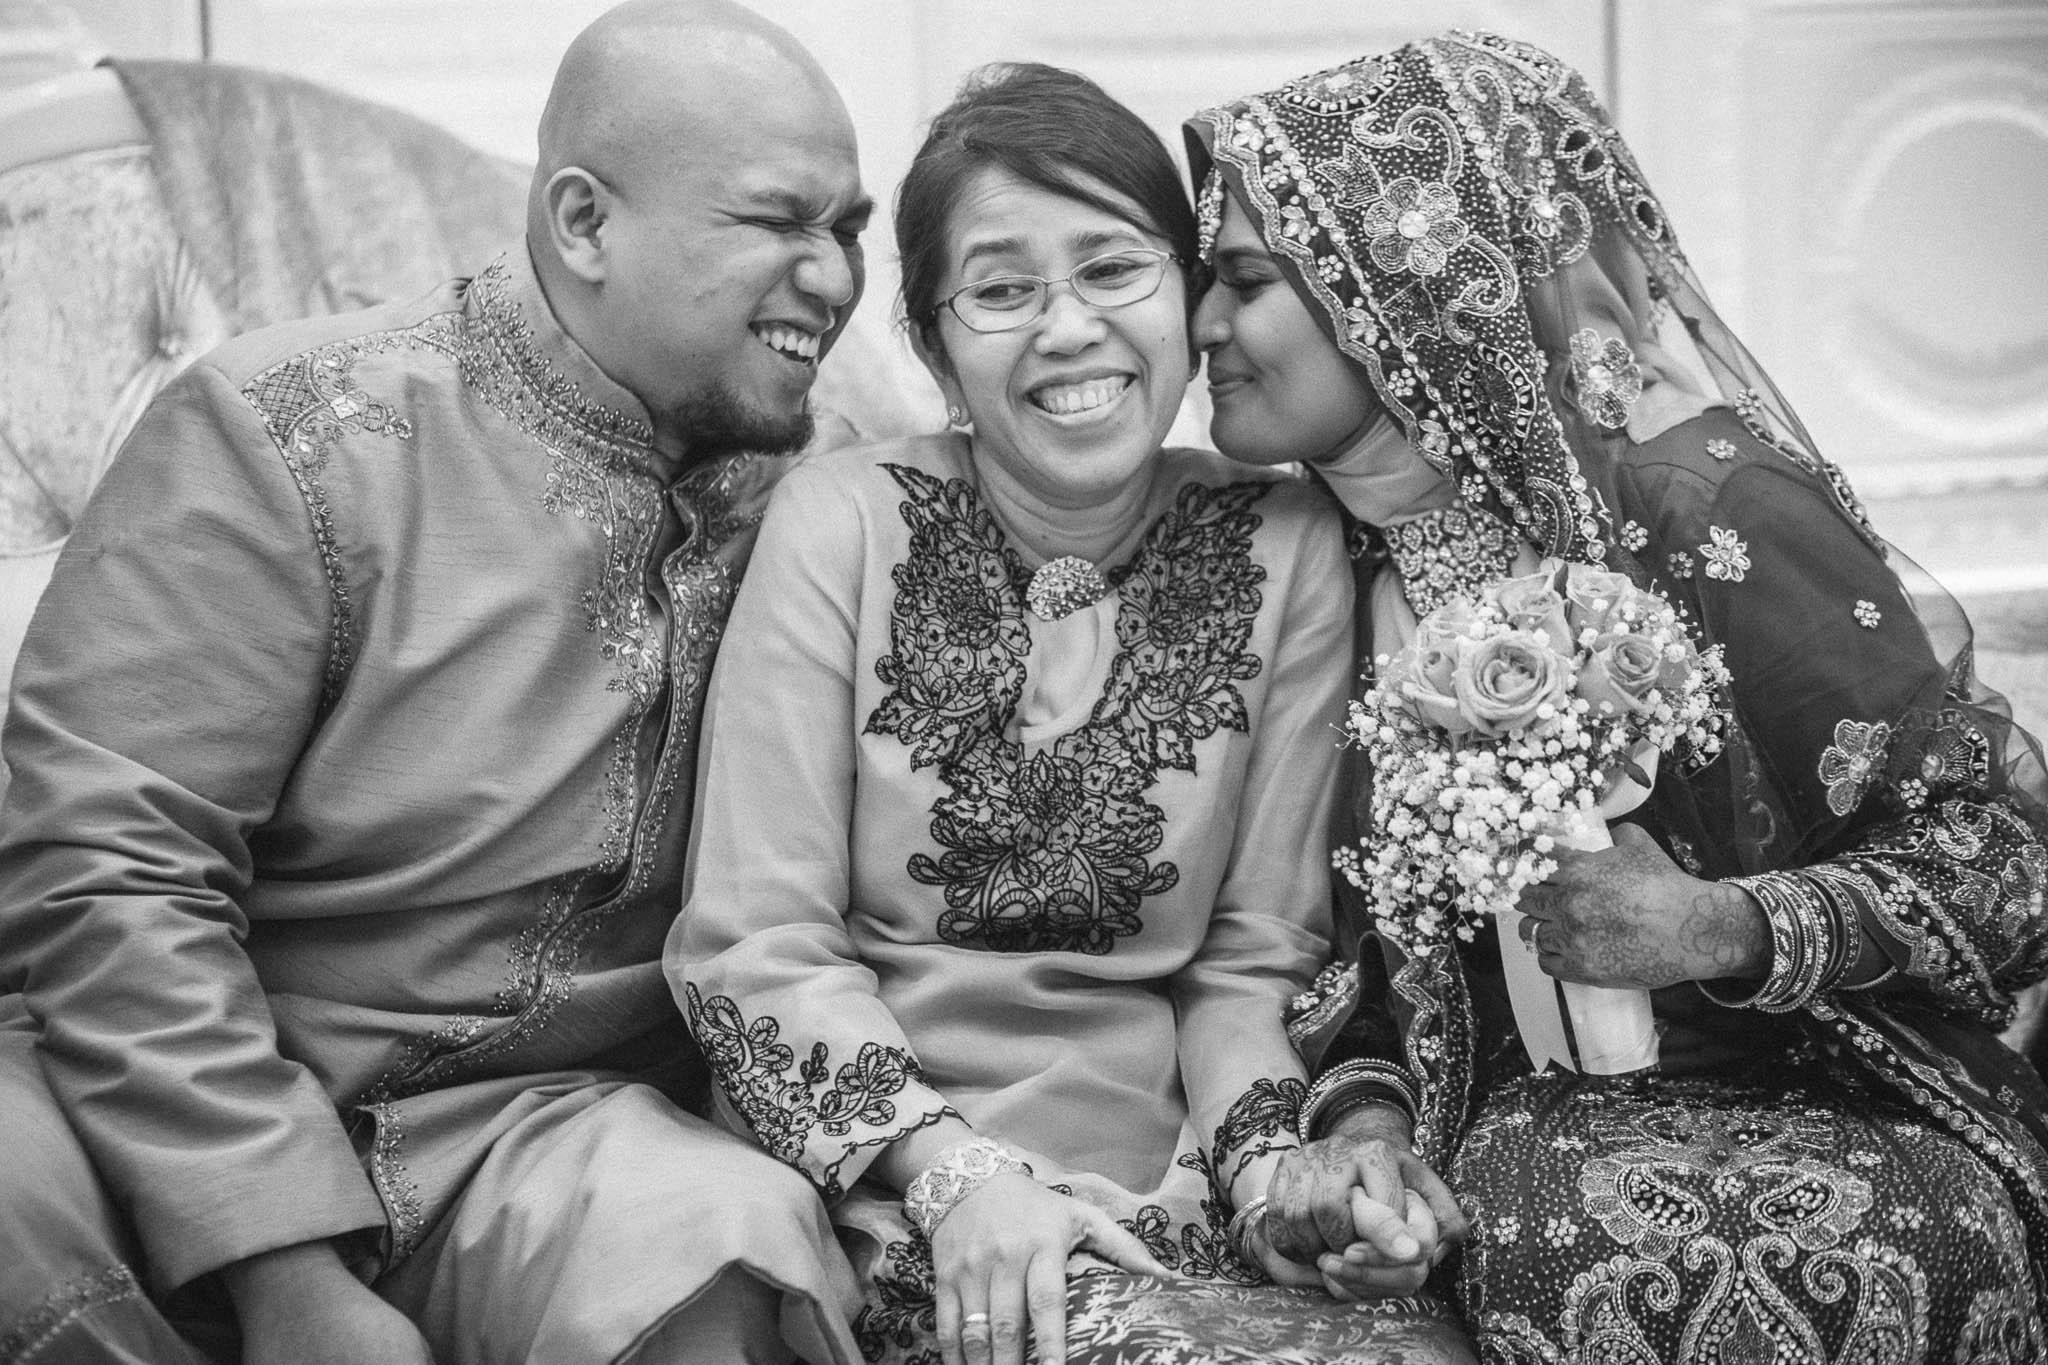 singapore-wedding-photographer-malay-indian-pre-wedding-travel-wmt-2015-shereen-farid-55.jpg